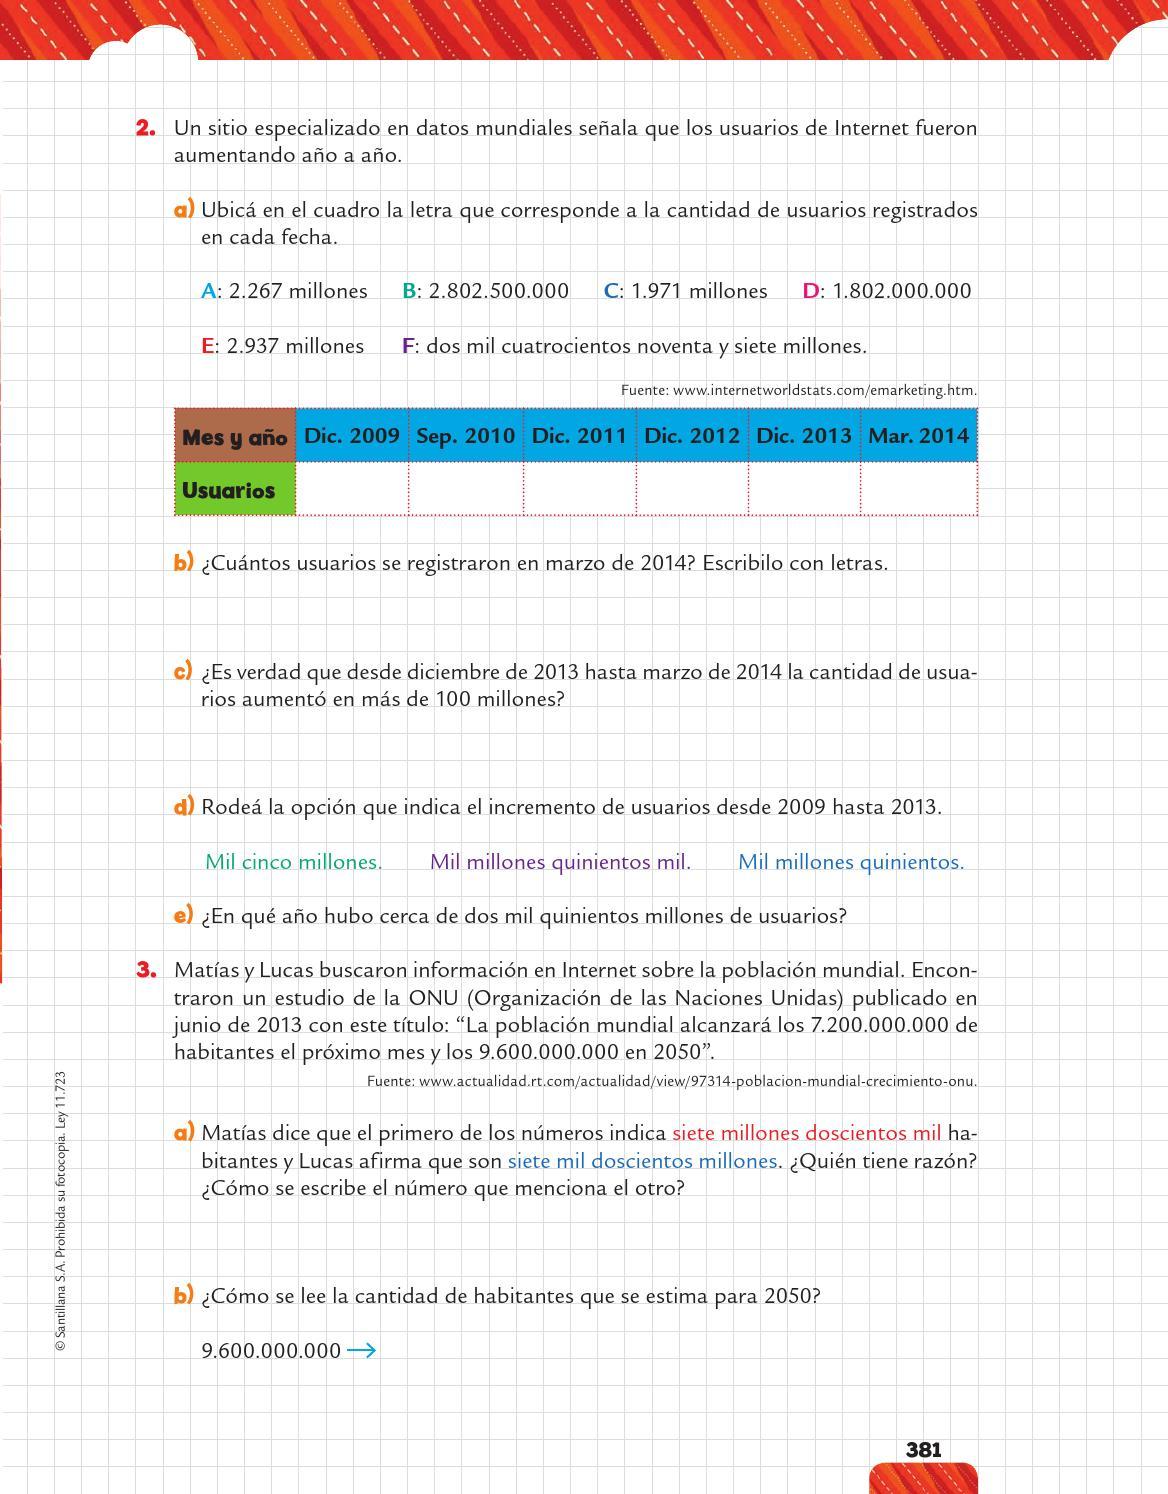 Manual 6 bonaerense en movimiento by santillana_argentina - issuu